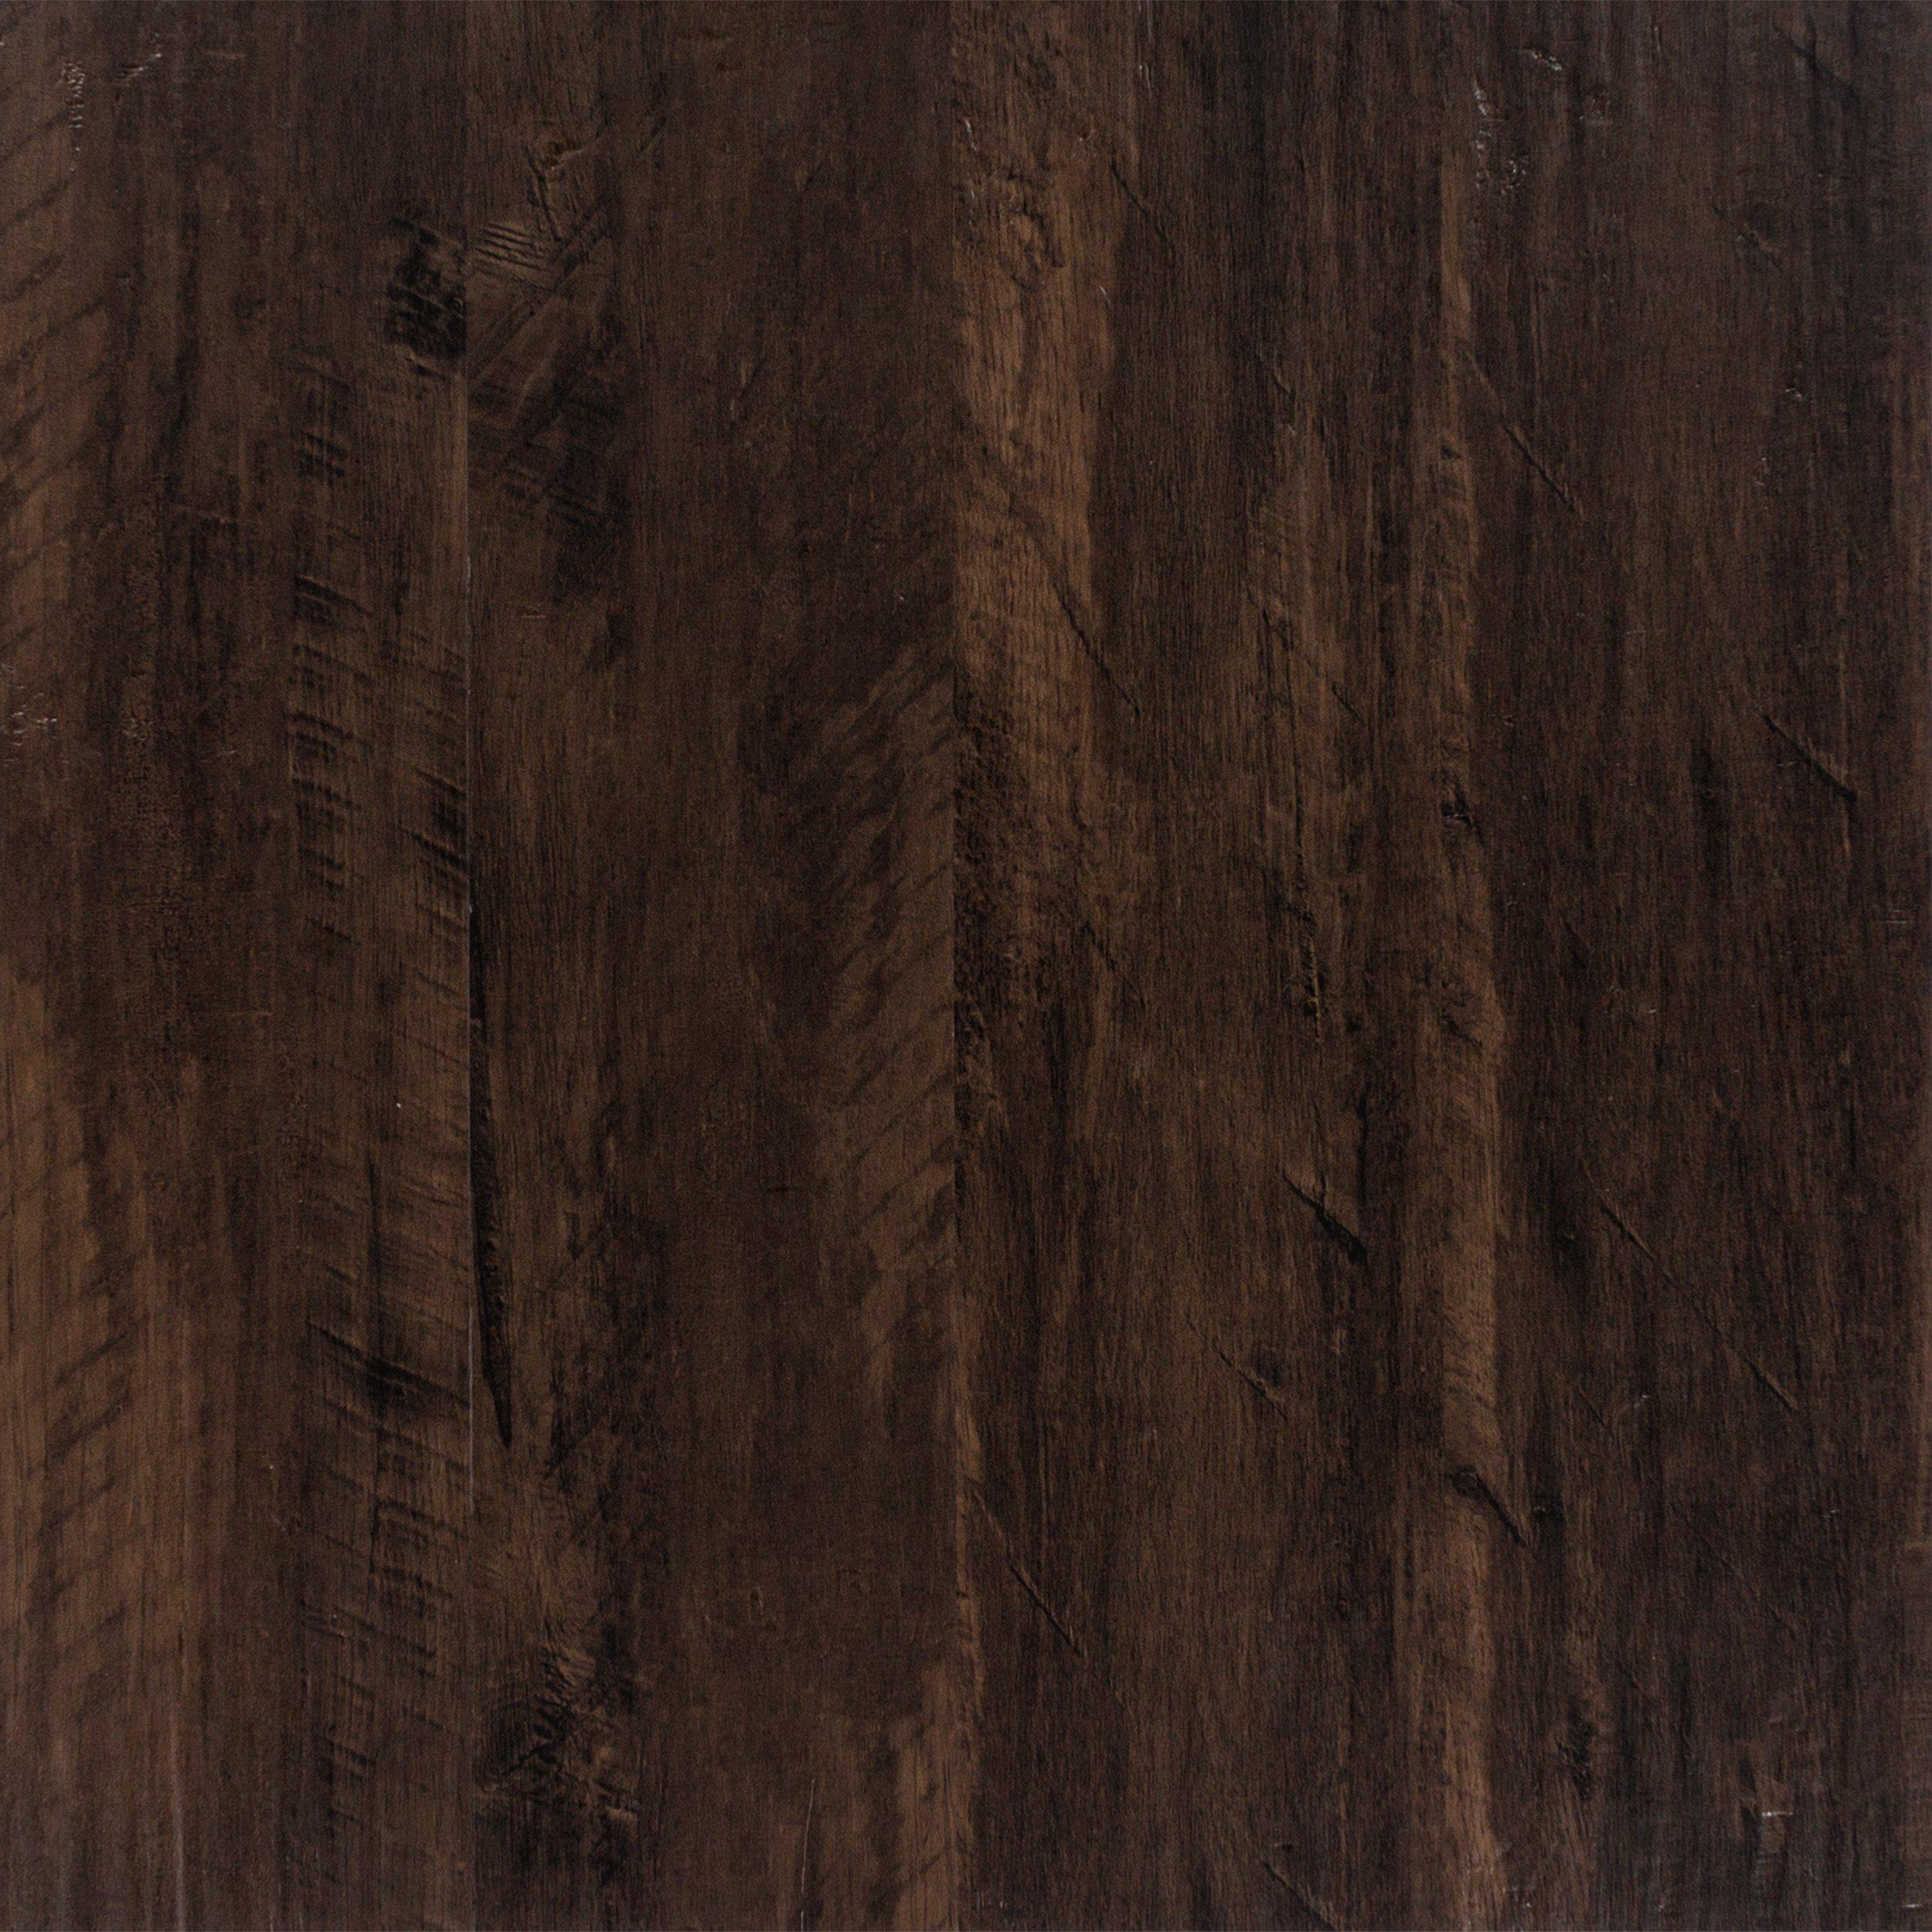 Luxury vinyl plank smartcore by natural floors 12piece for Casa moderna vinyl flooring